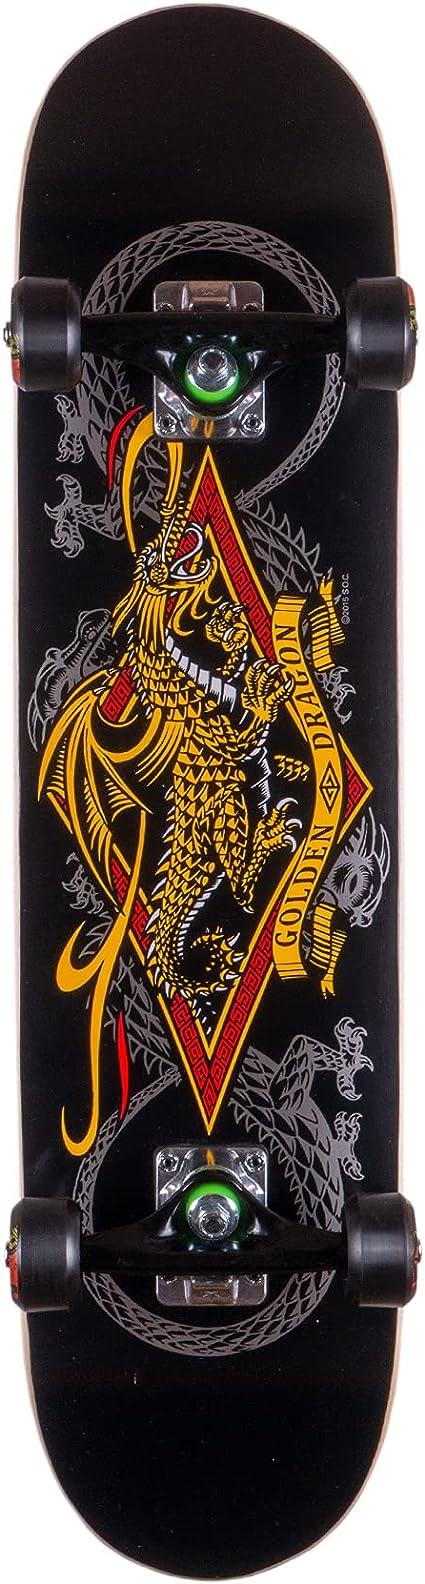 powell golden dragon flying dragon complete skateboard reviews